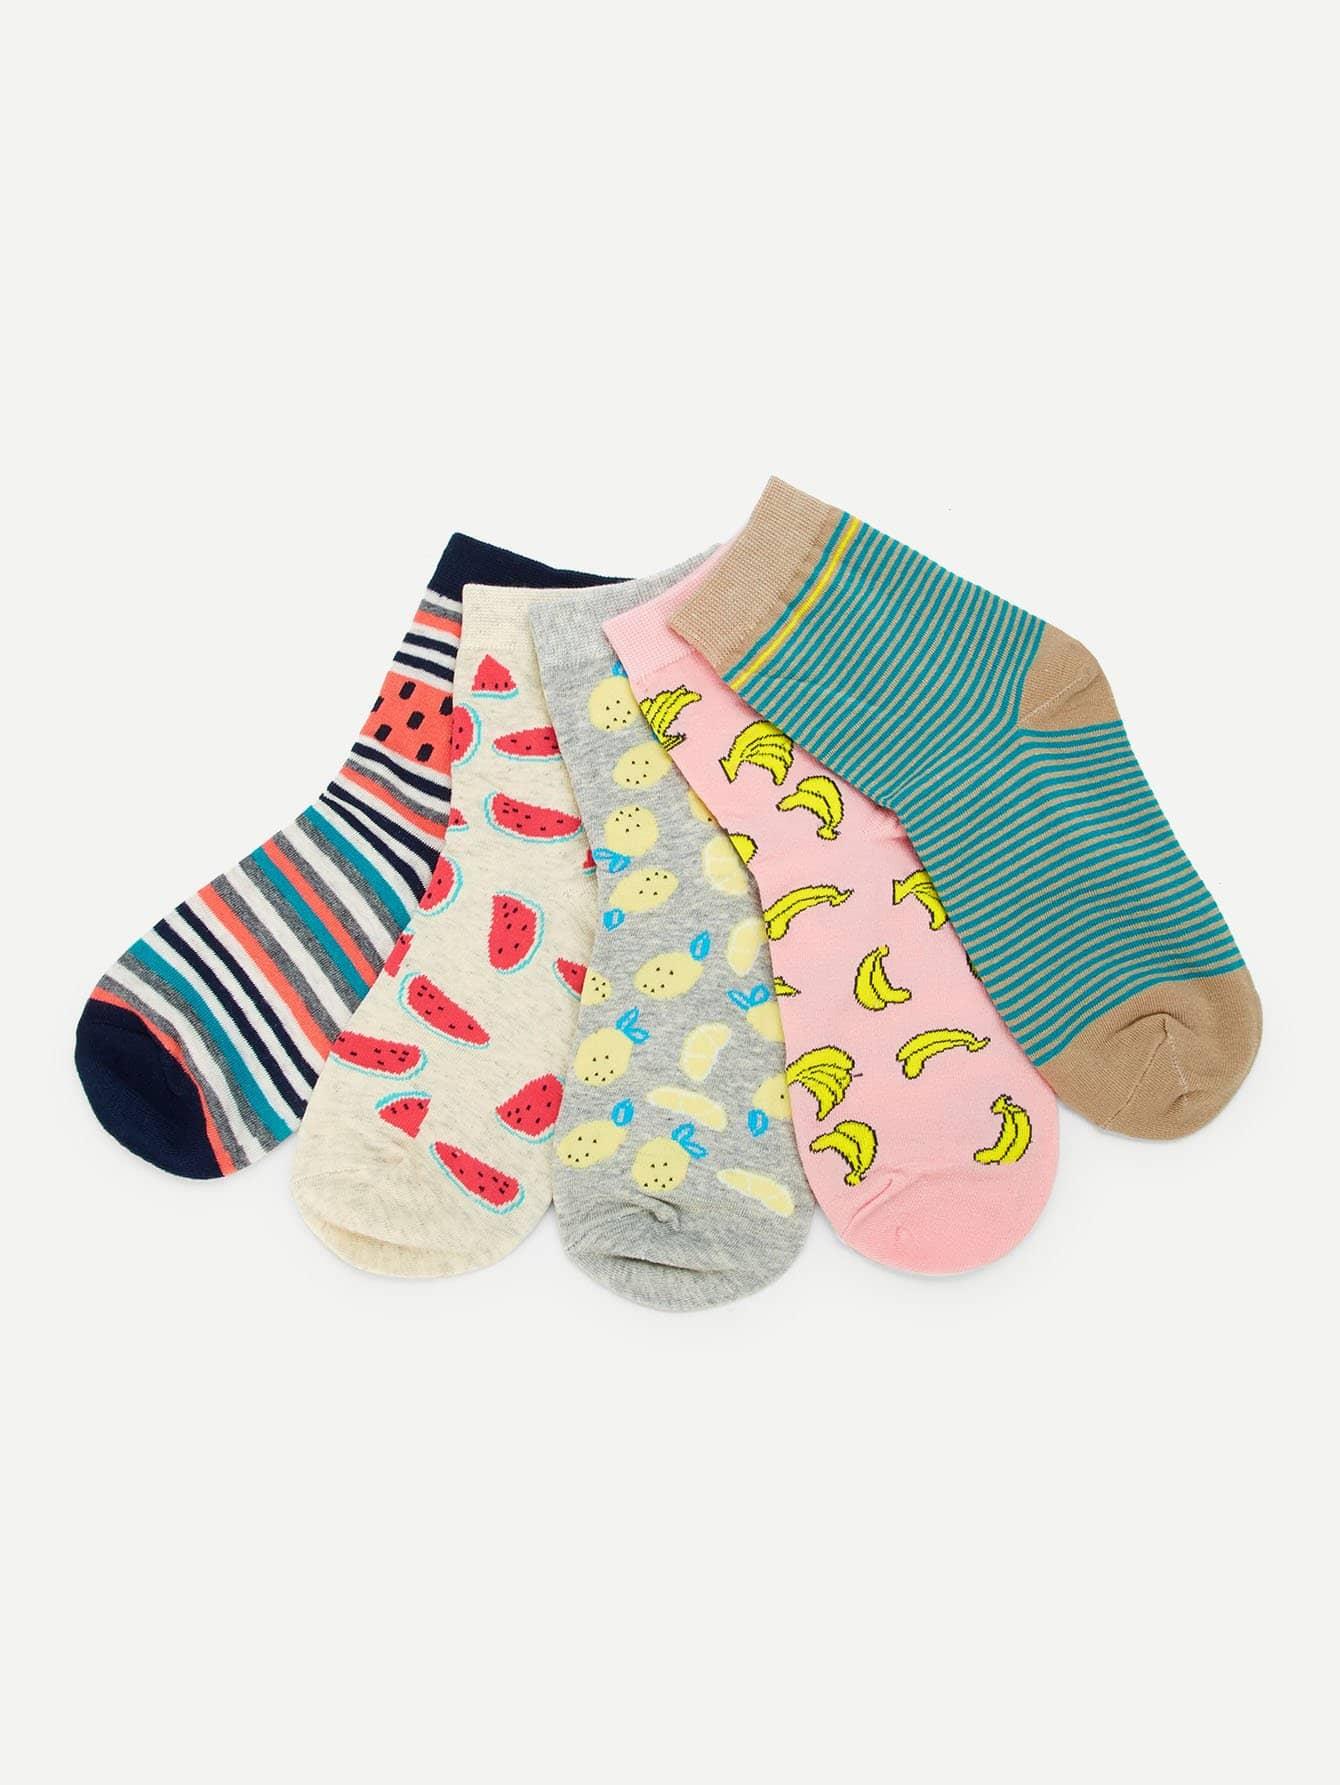 Fruit Print Ankle Socks 5pairs